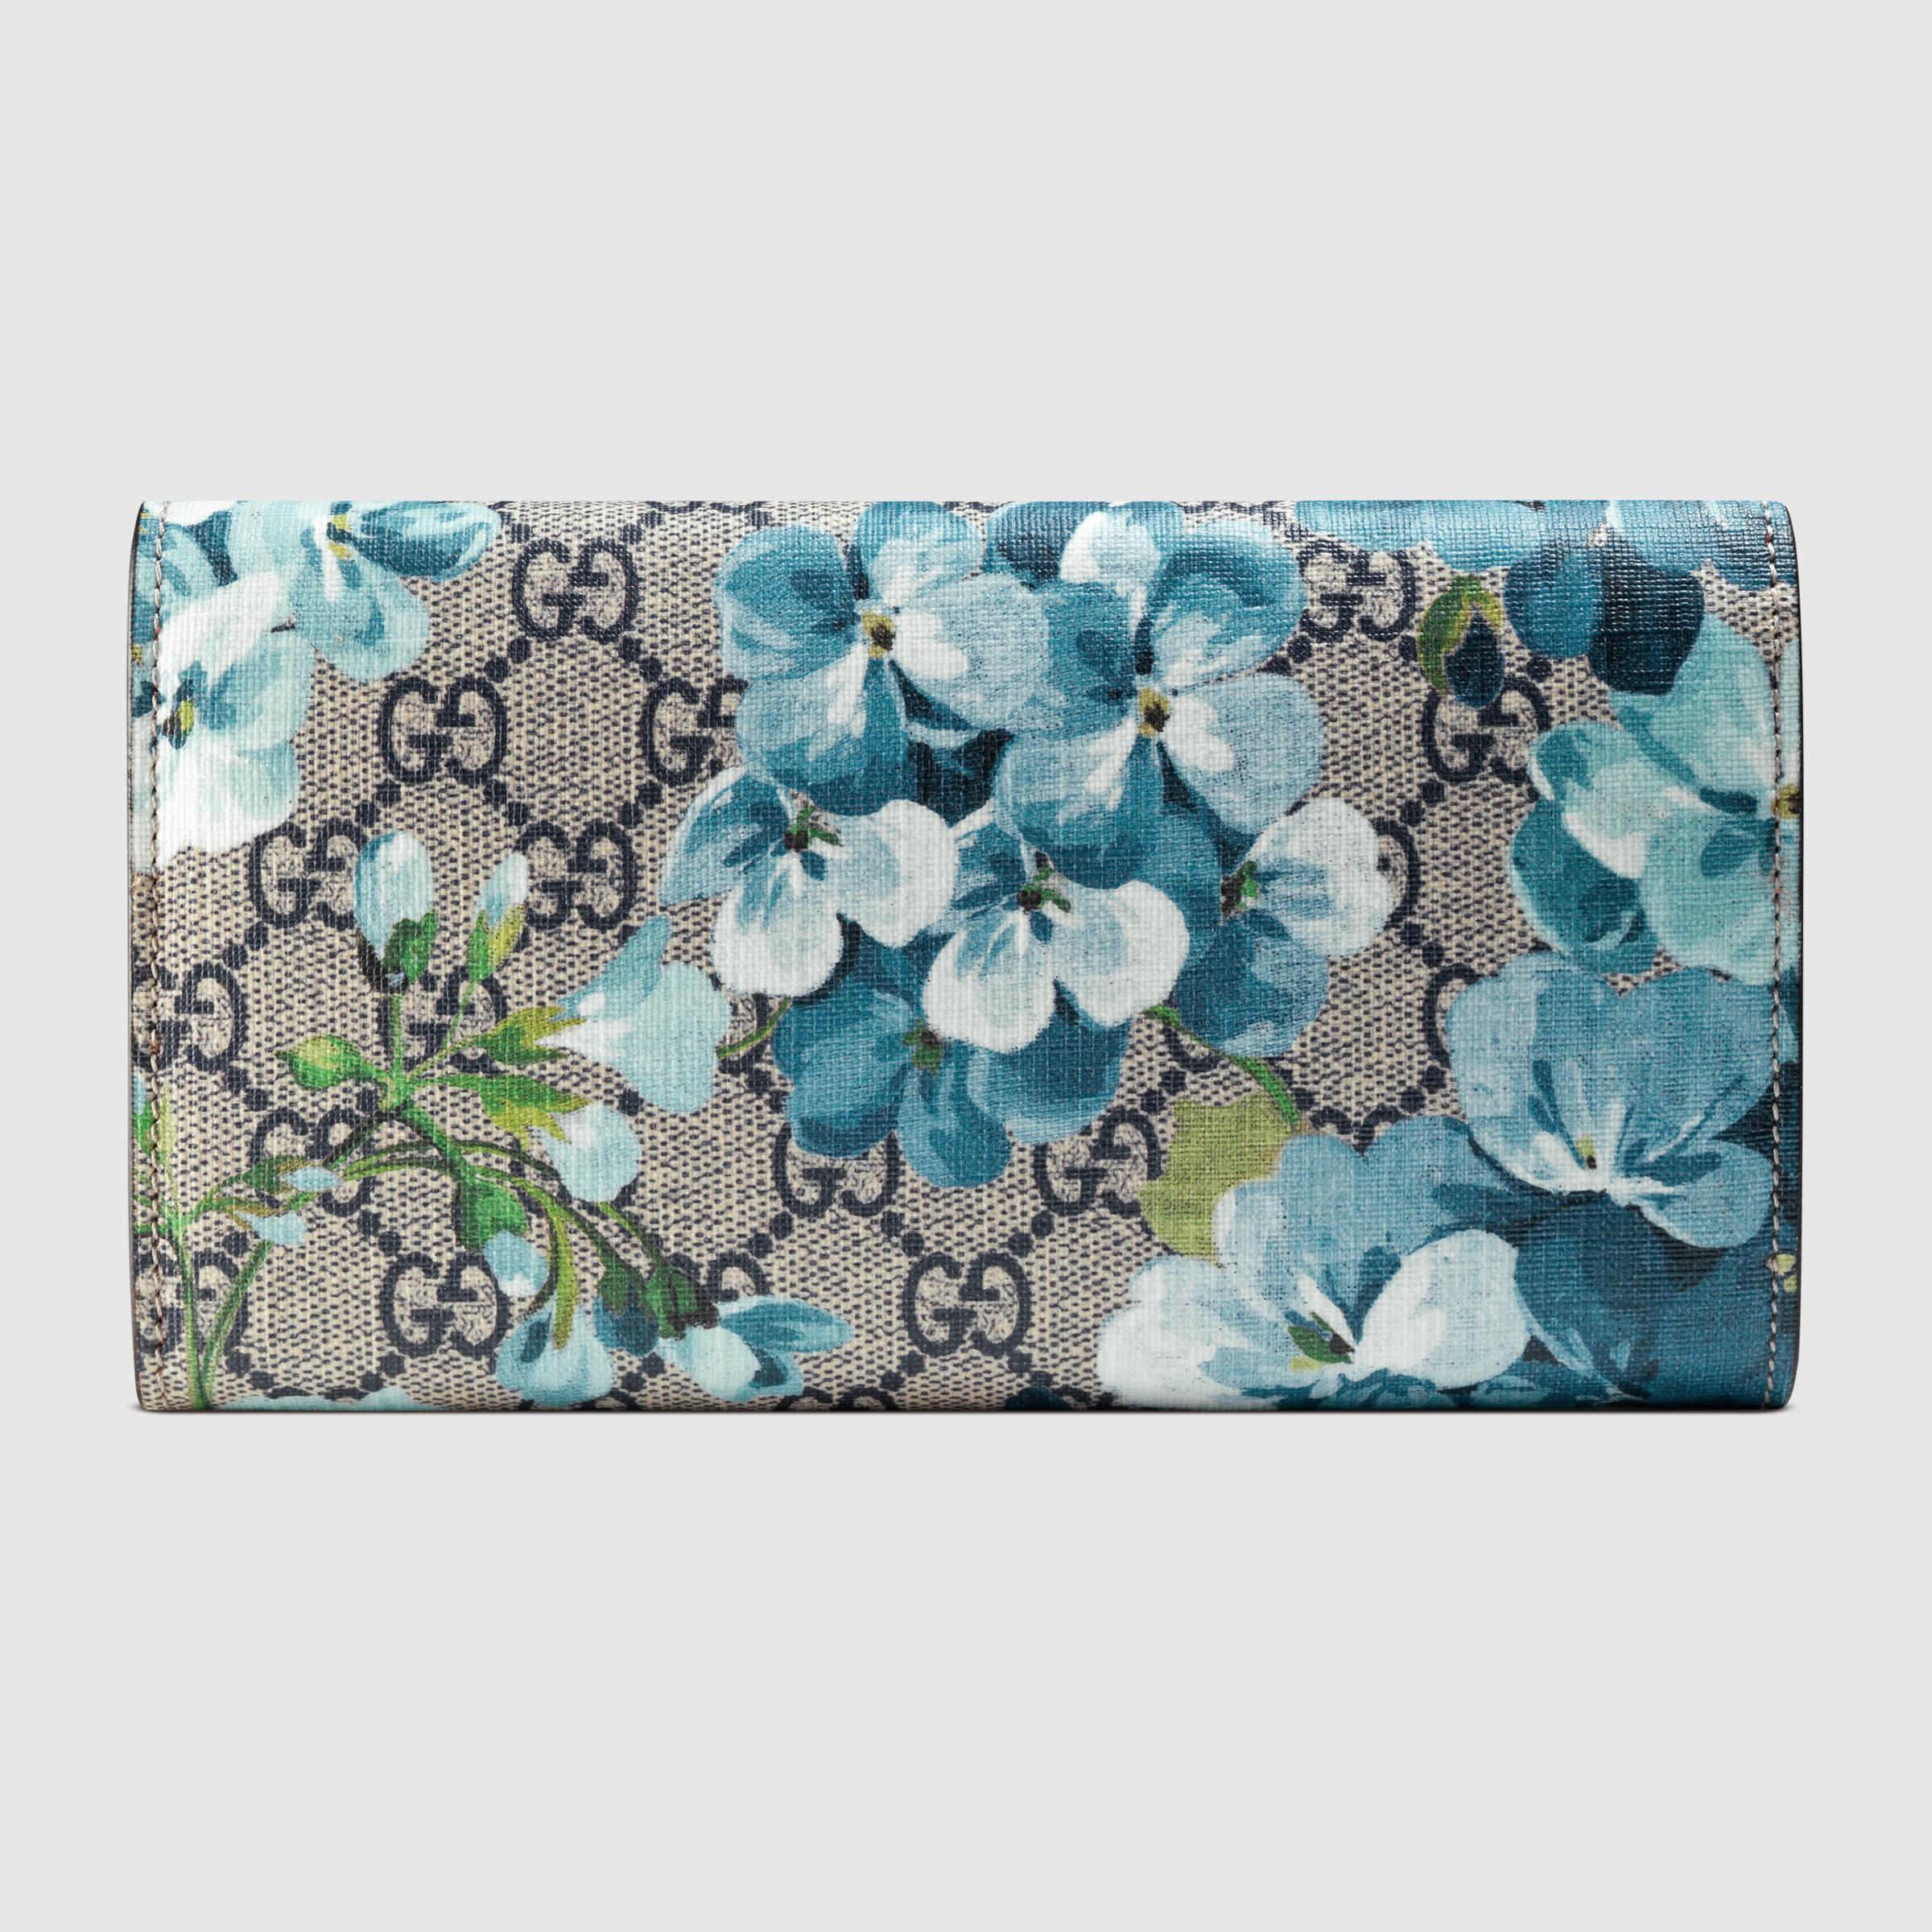 17696a4b8a61a7 Gucci Gg Blooms Continental Wallet - Lyst